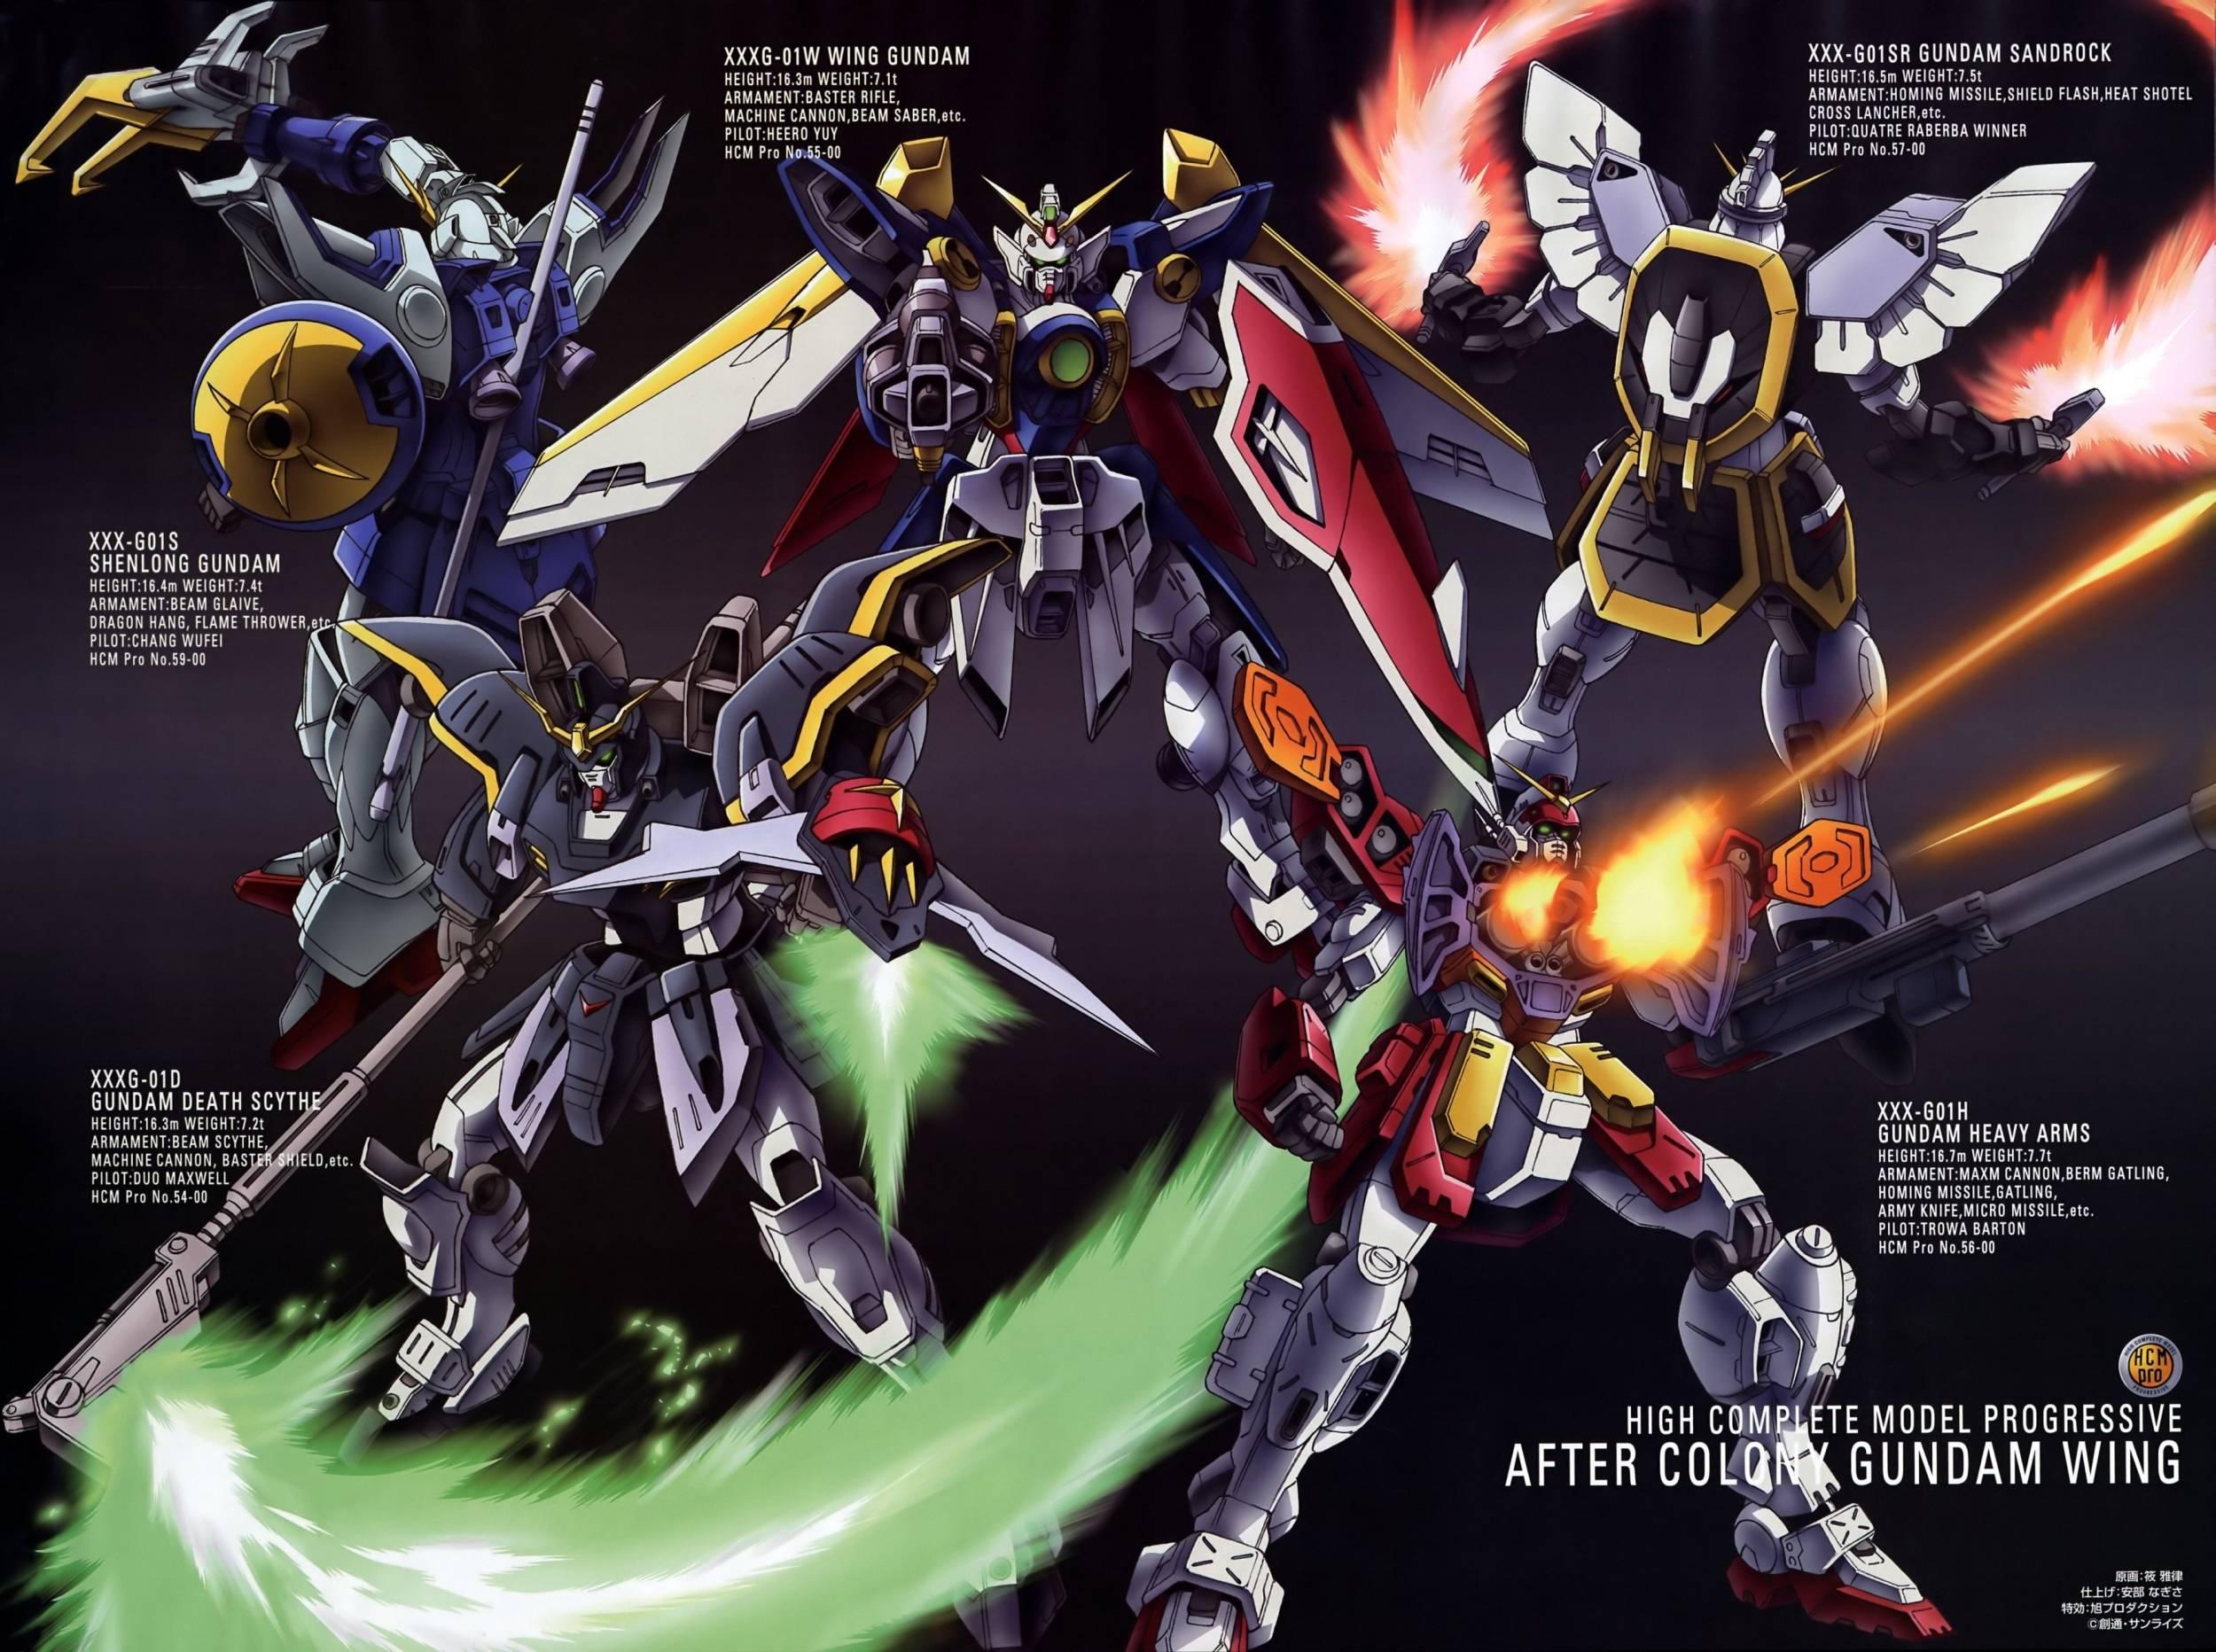 Gundam Wing 25001864 Wallpaper 916560 2500x1864